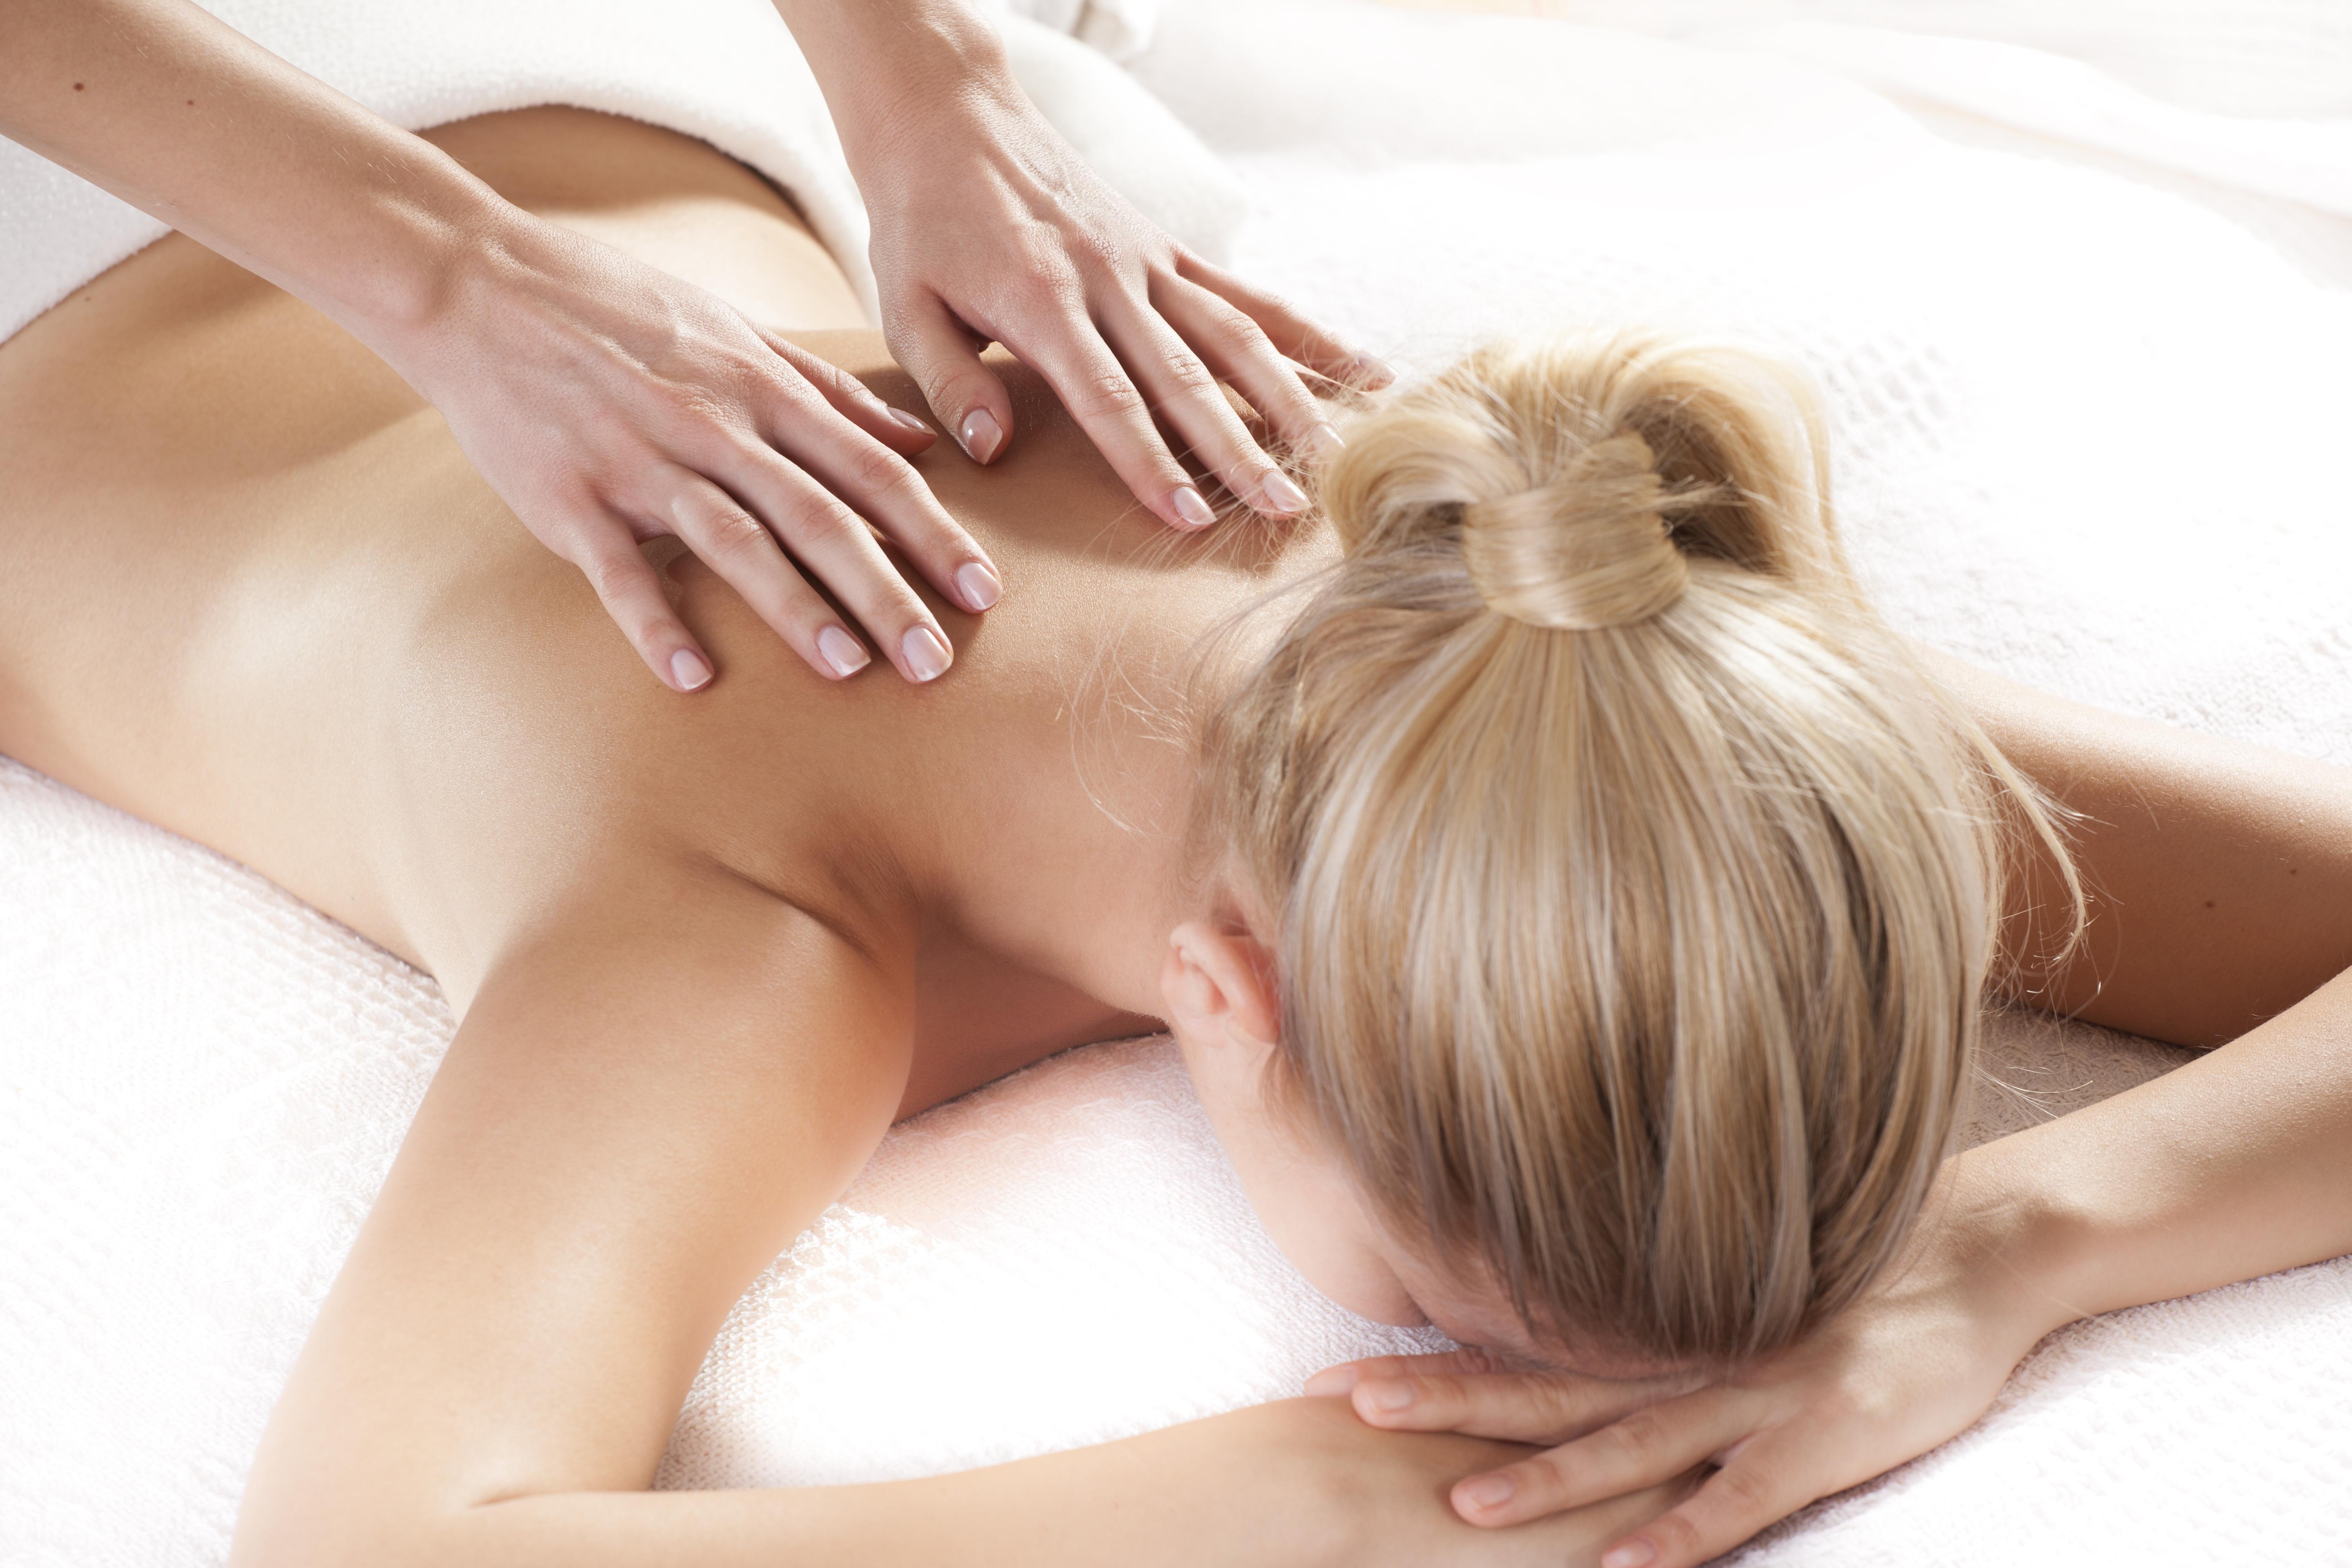 body to body massage dating polen